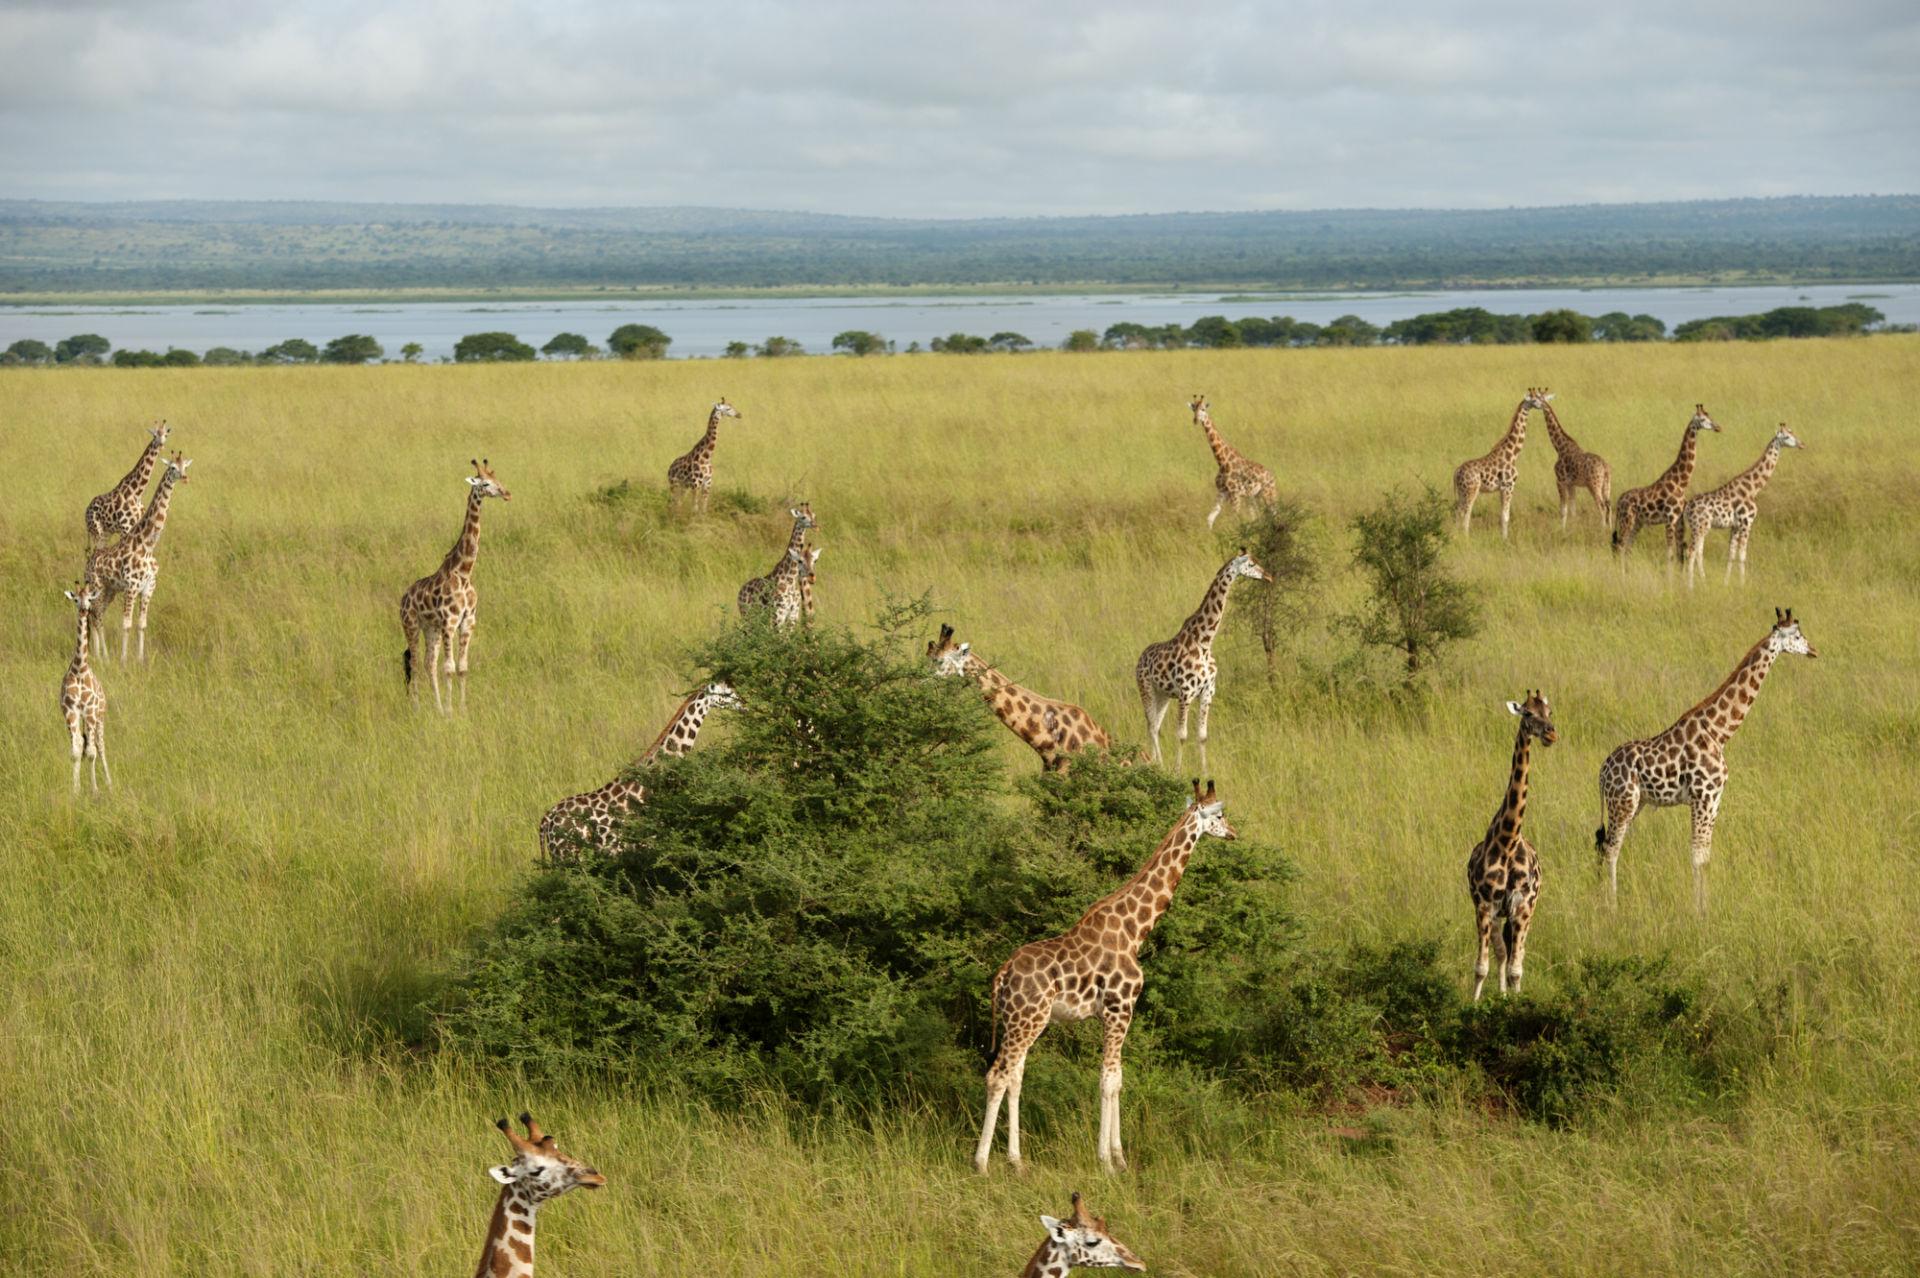 Rothchild's giraffe at Murchison Falls National Park, Uganda.Pilot was Mike Epstein, epstar@gmail.com, of the Kampala Aeroclub.